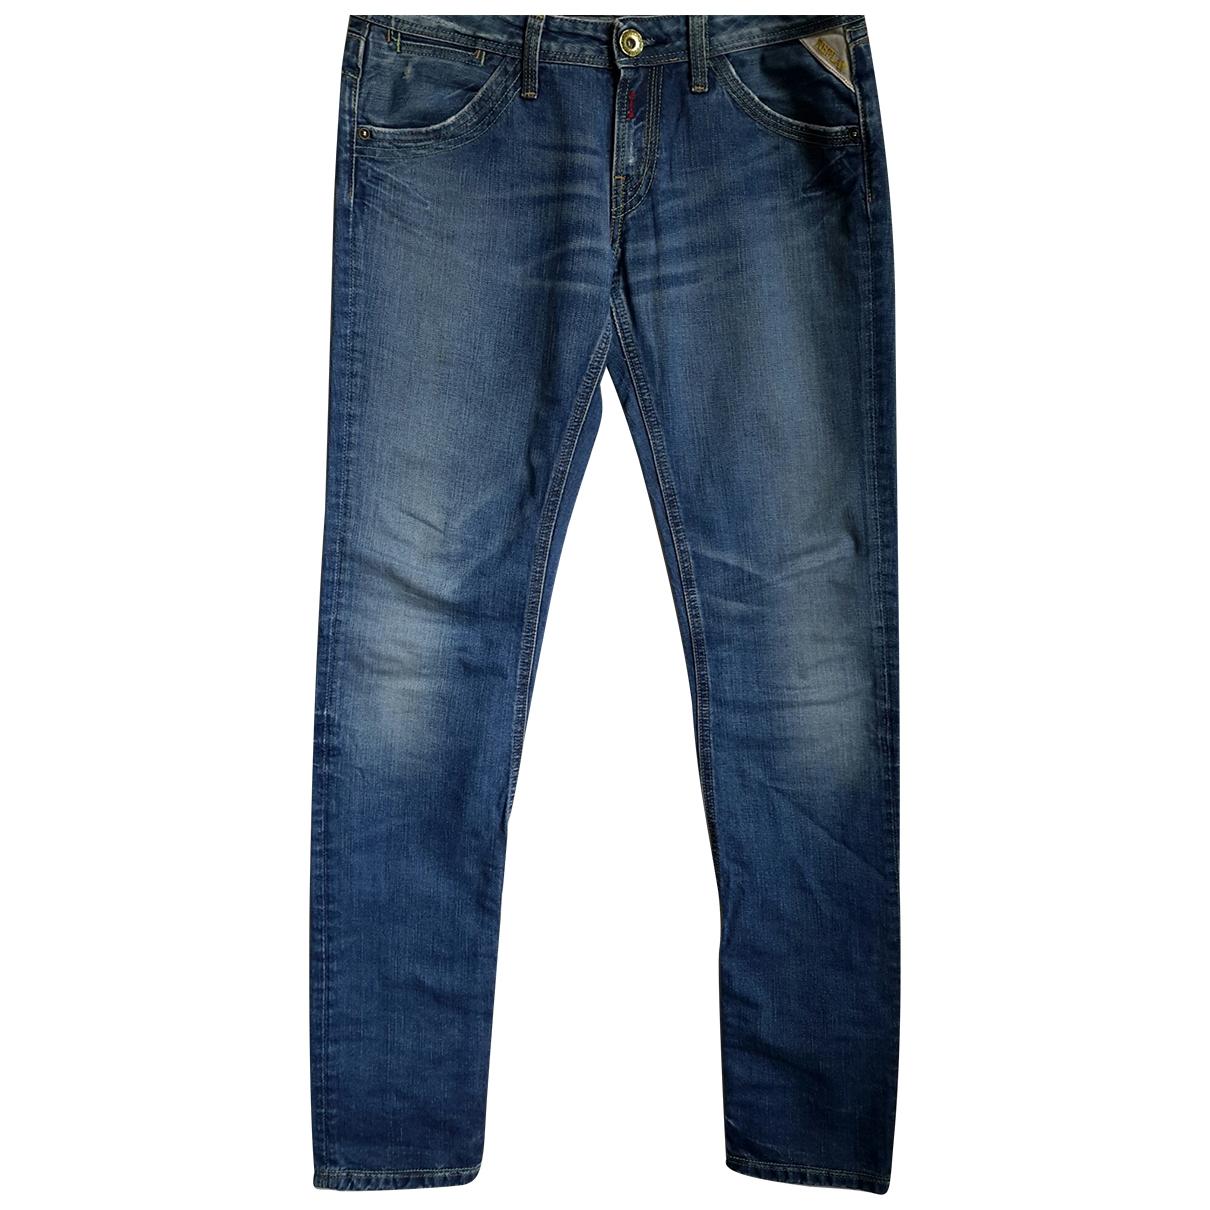 Replay \N Blue Denim - Jeans Trousers for Women 40 IT